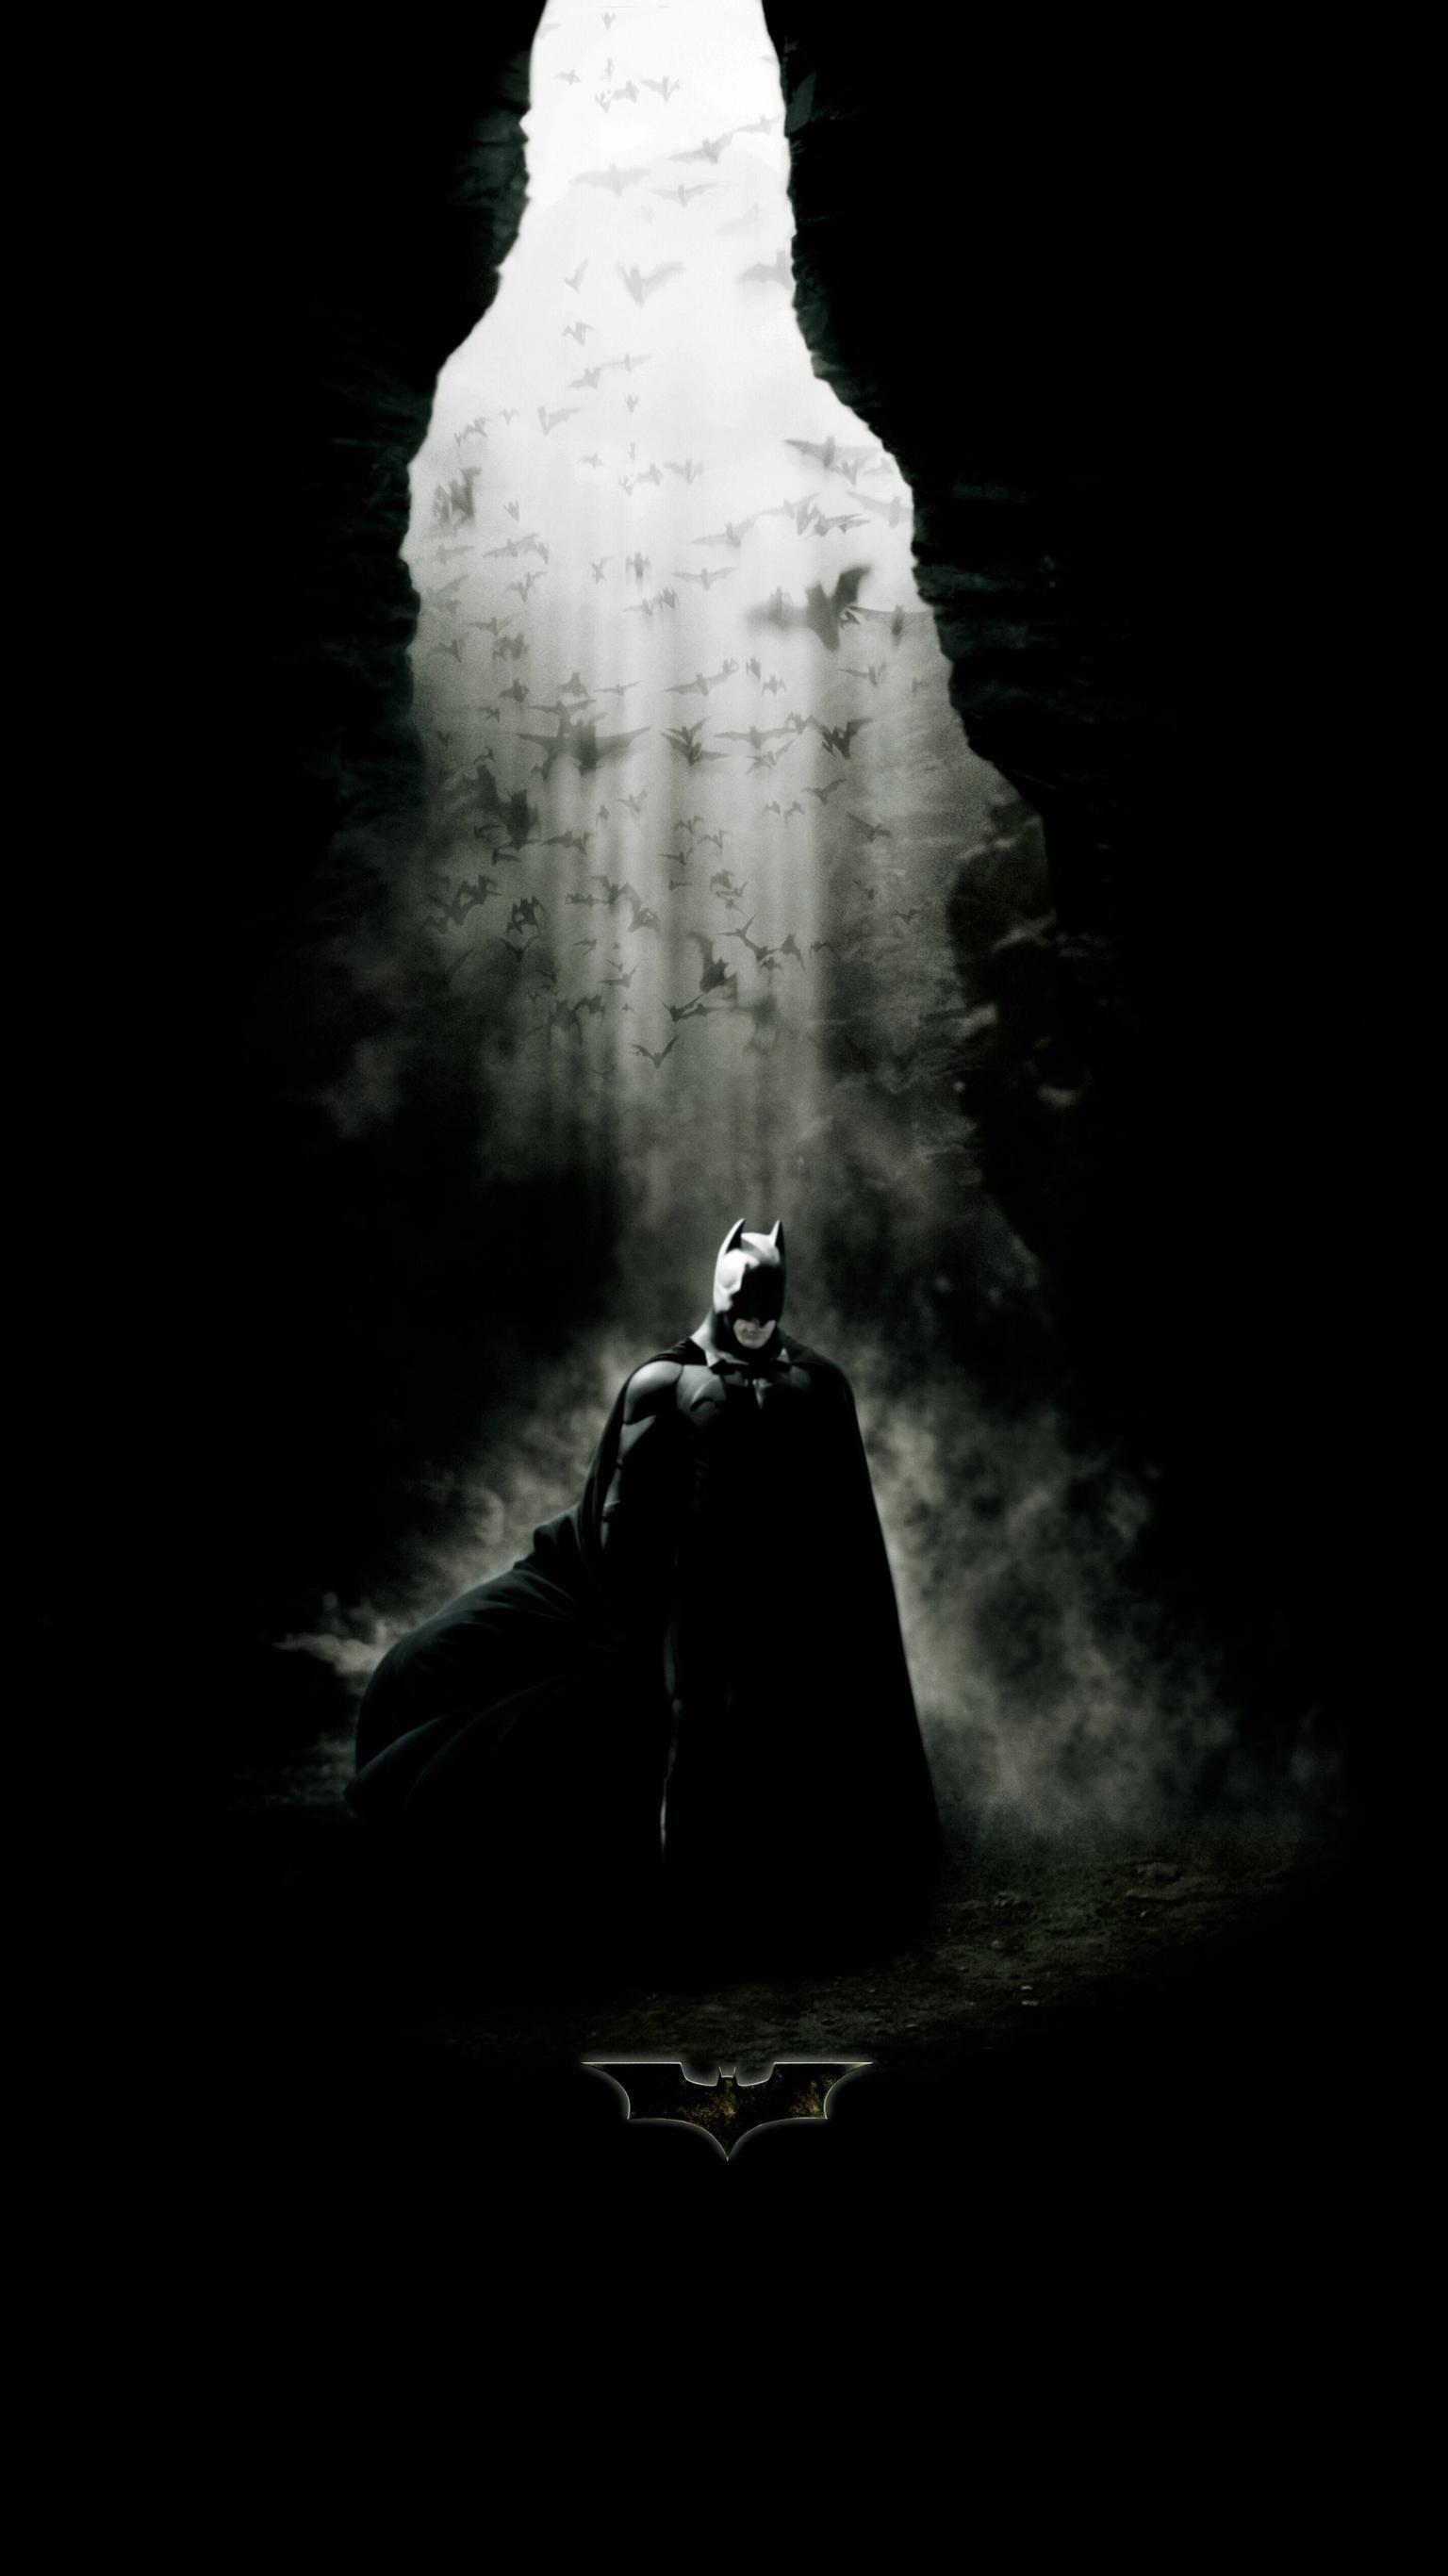 Moviemania Textless High Resolution Movie Wallpapers Batman Begins Batman Wallpaper Batman The Dark Knight